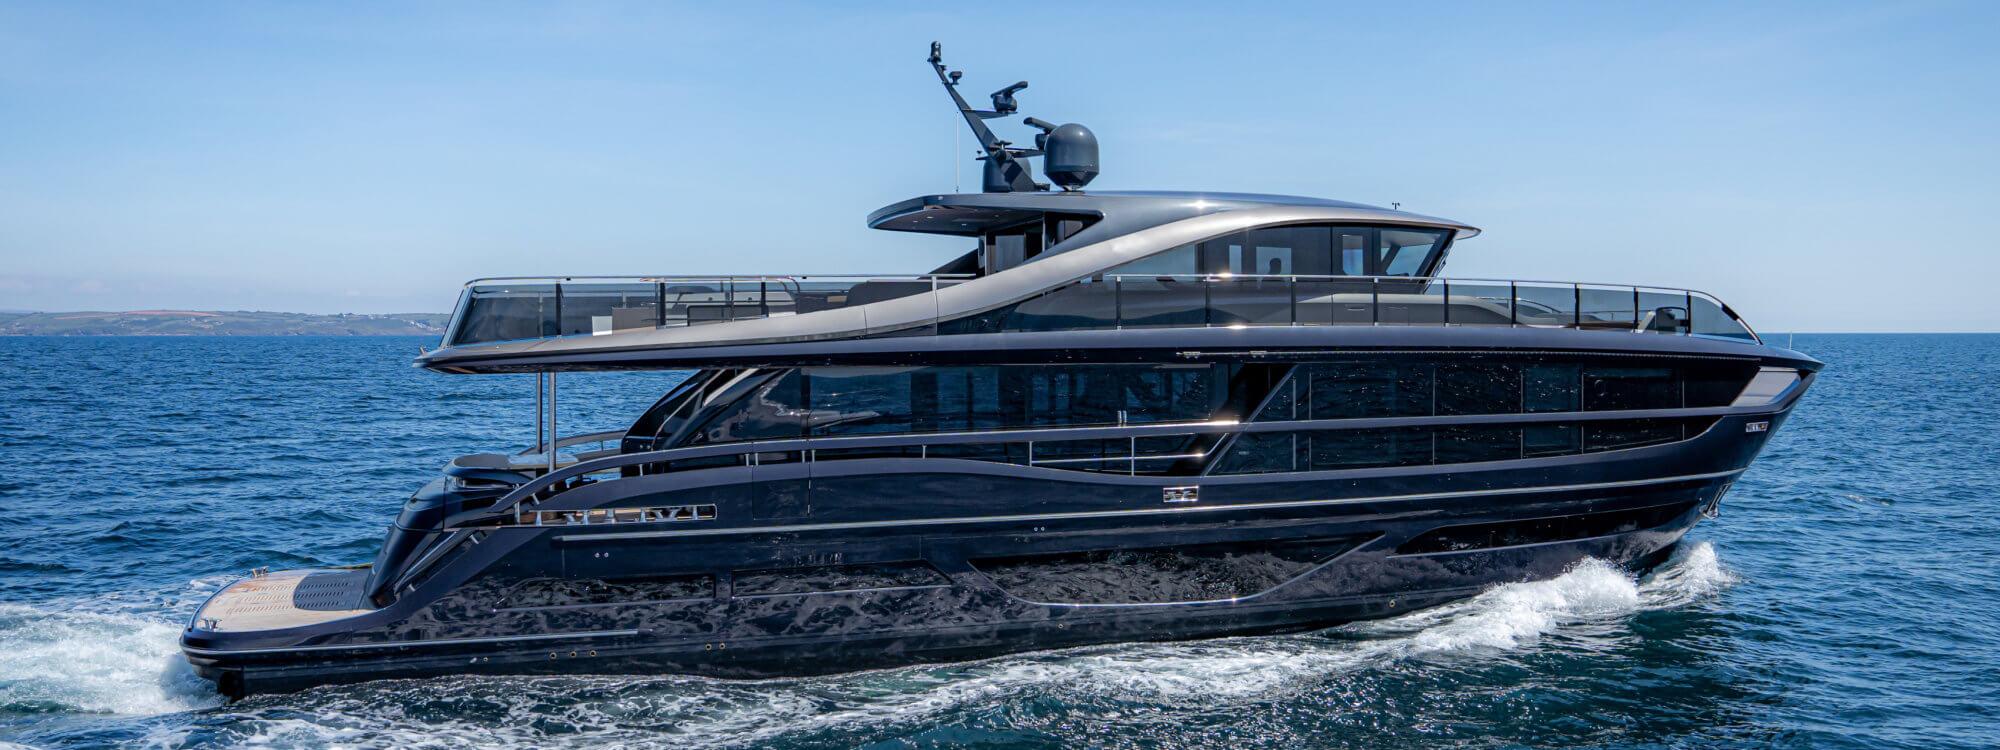 Princess Yachts launch the X95, beautifully sculpted using Scott Bader resins, gelcoats and adhesives